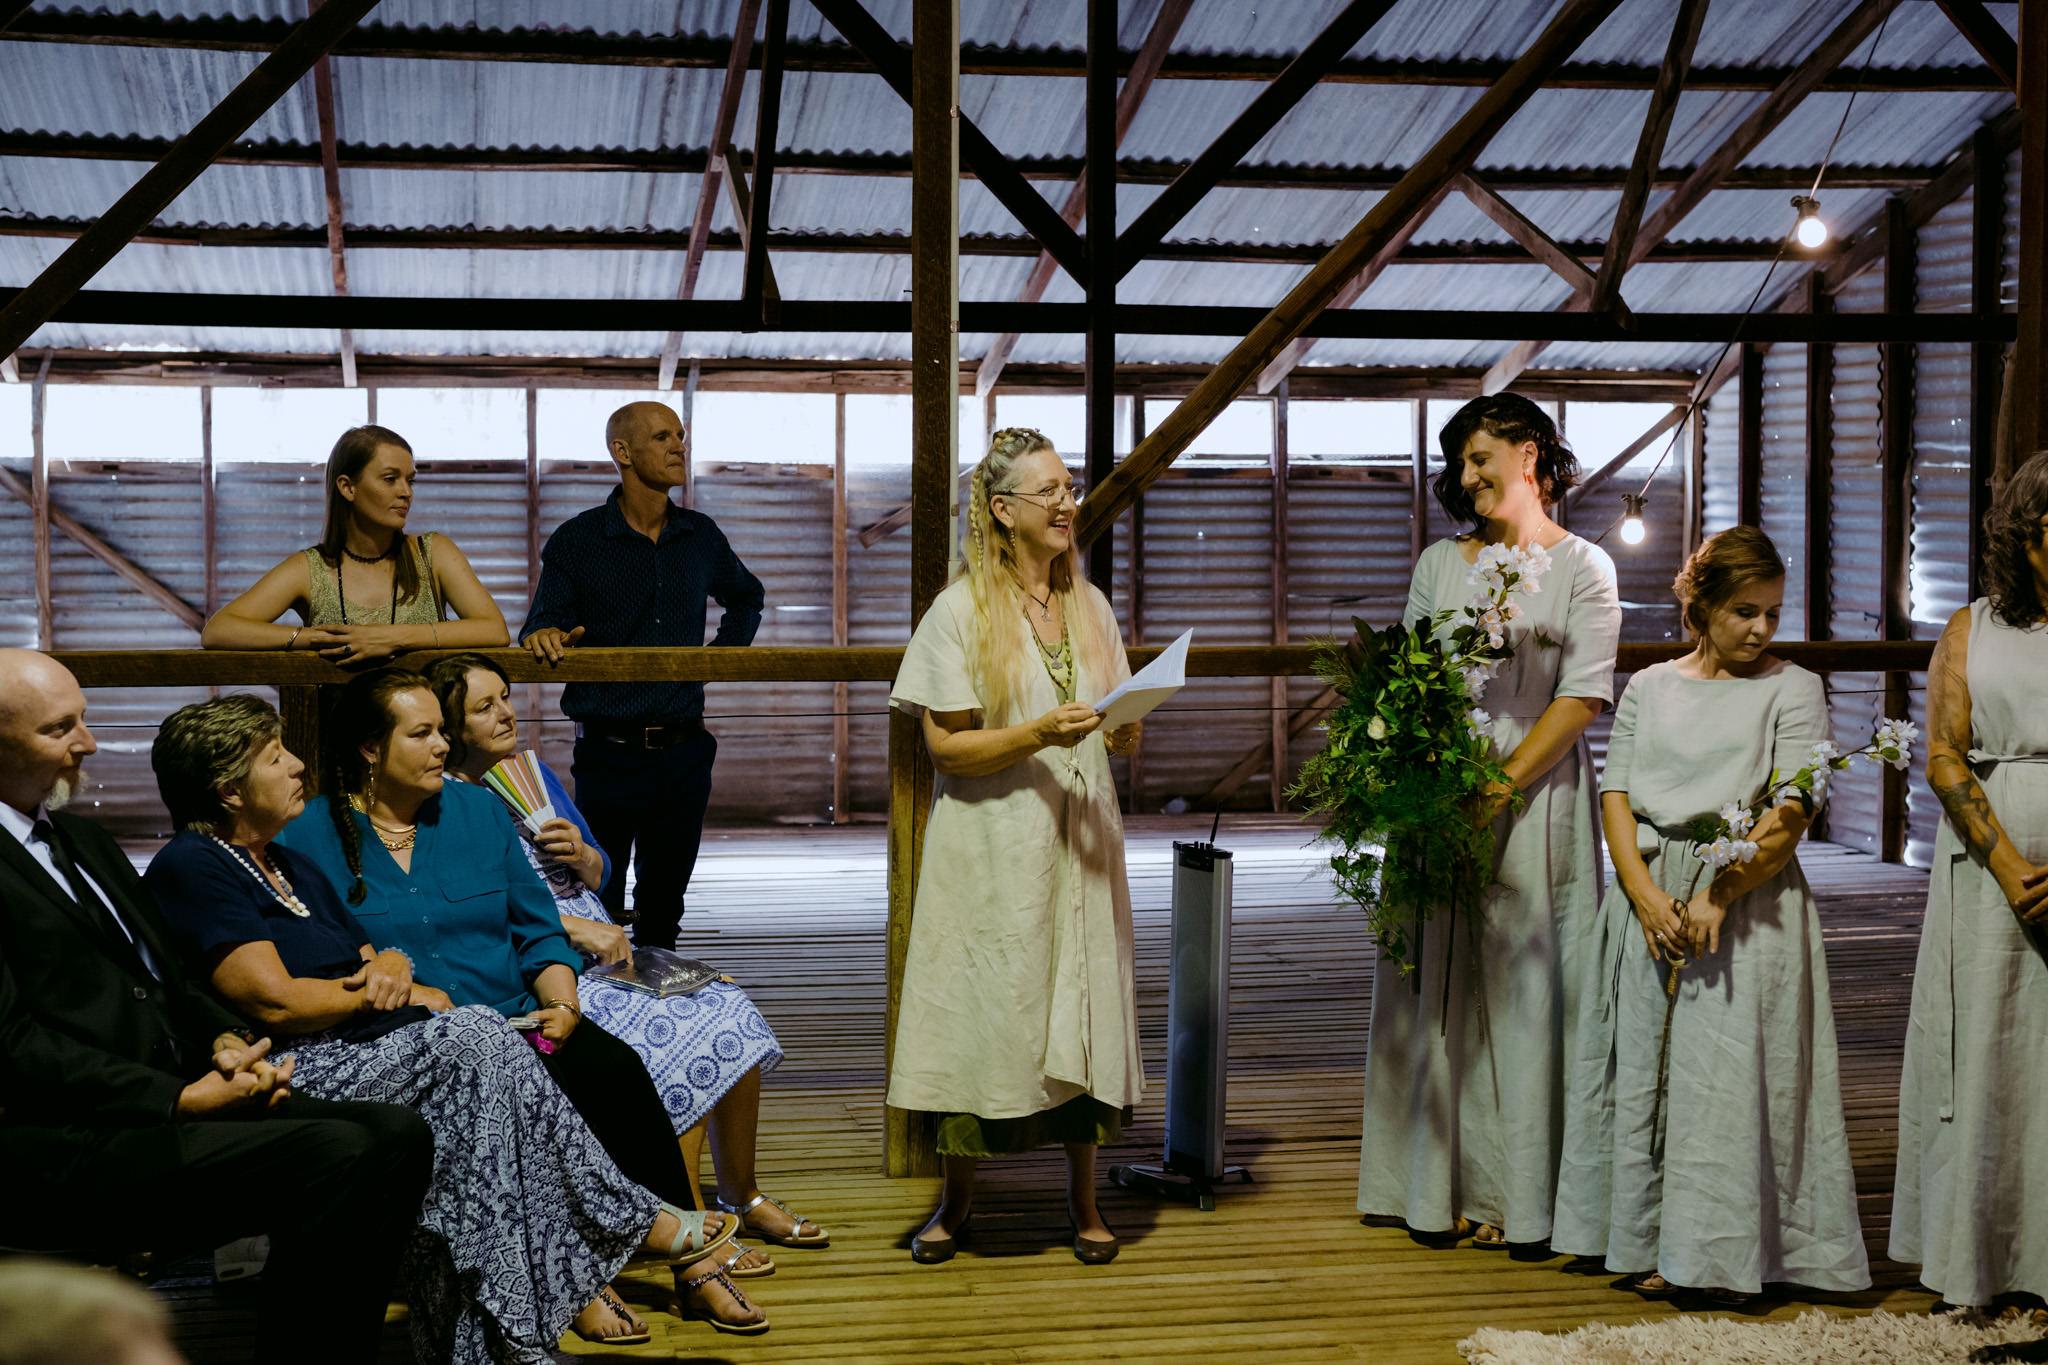 Yarralumla Woolshed Canberra Wedding Photographer Erin Latimore_079.JPG